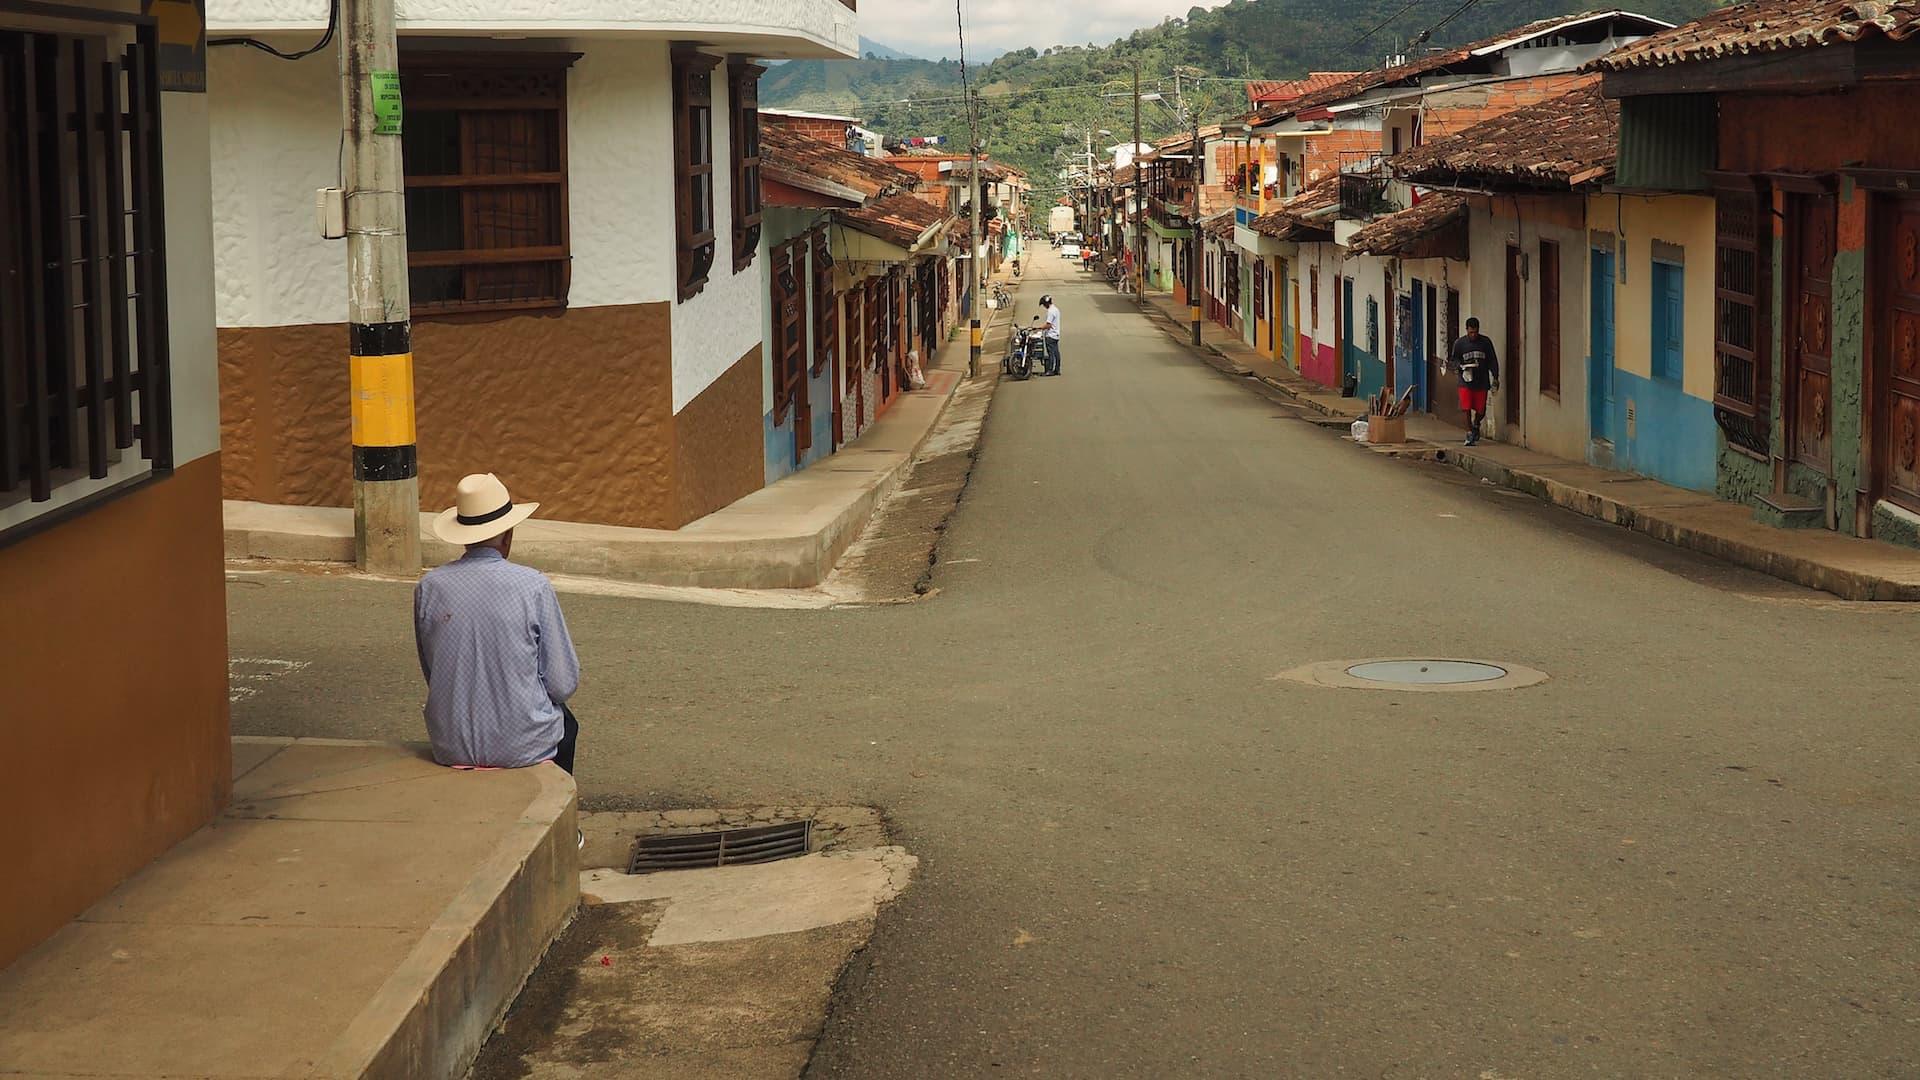 El Jardin street